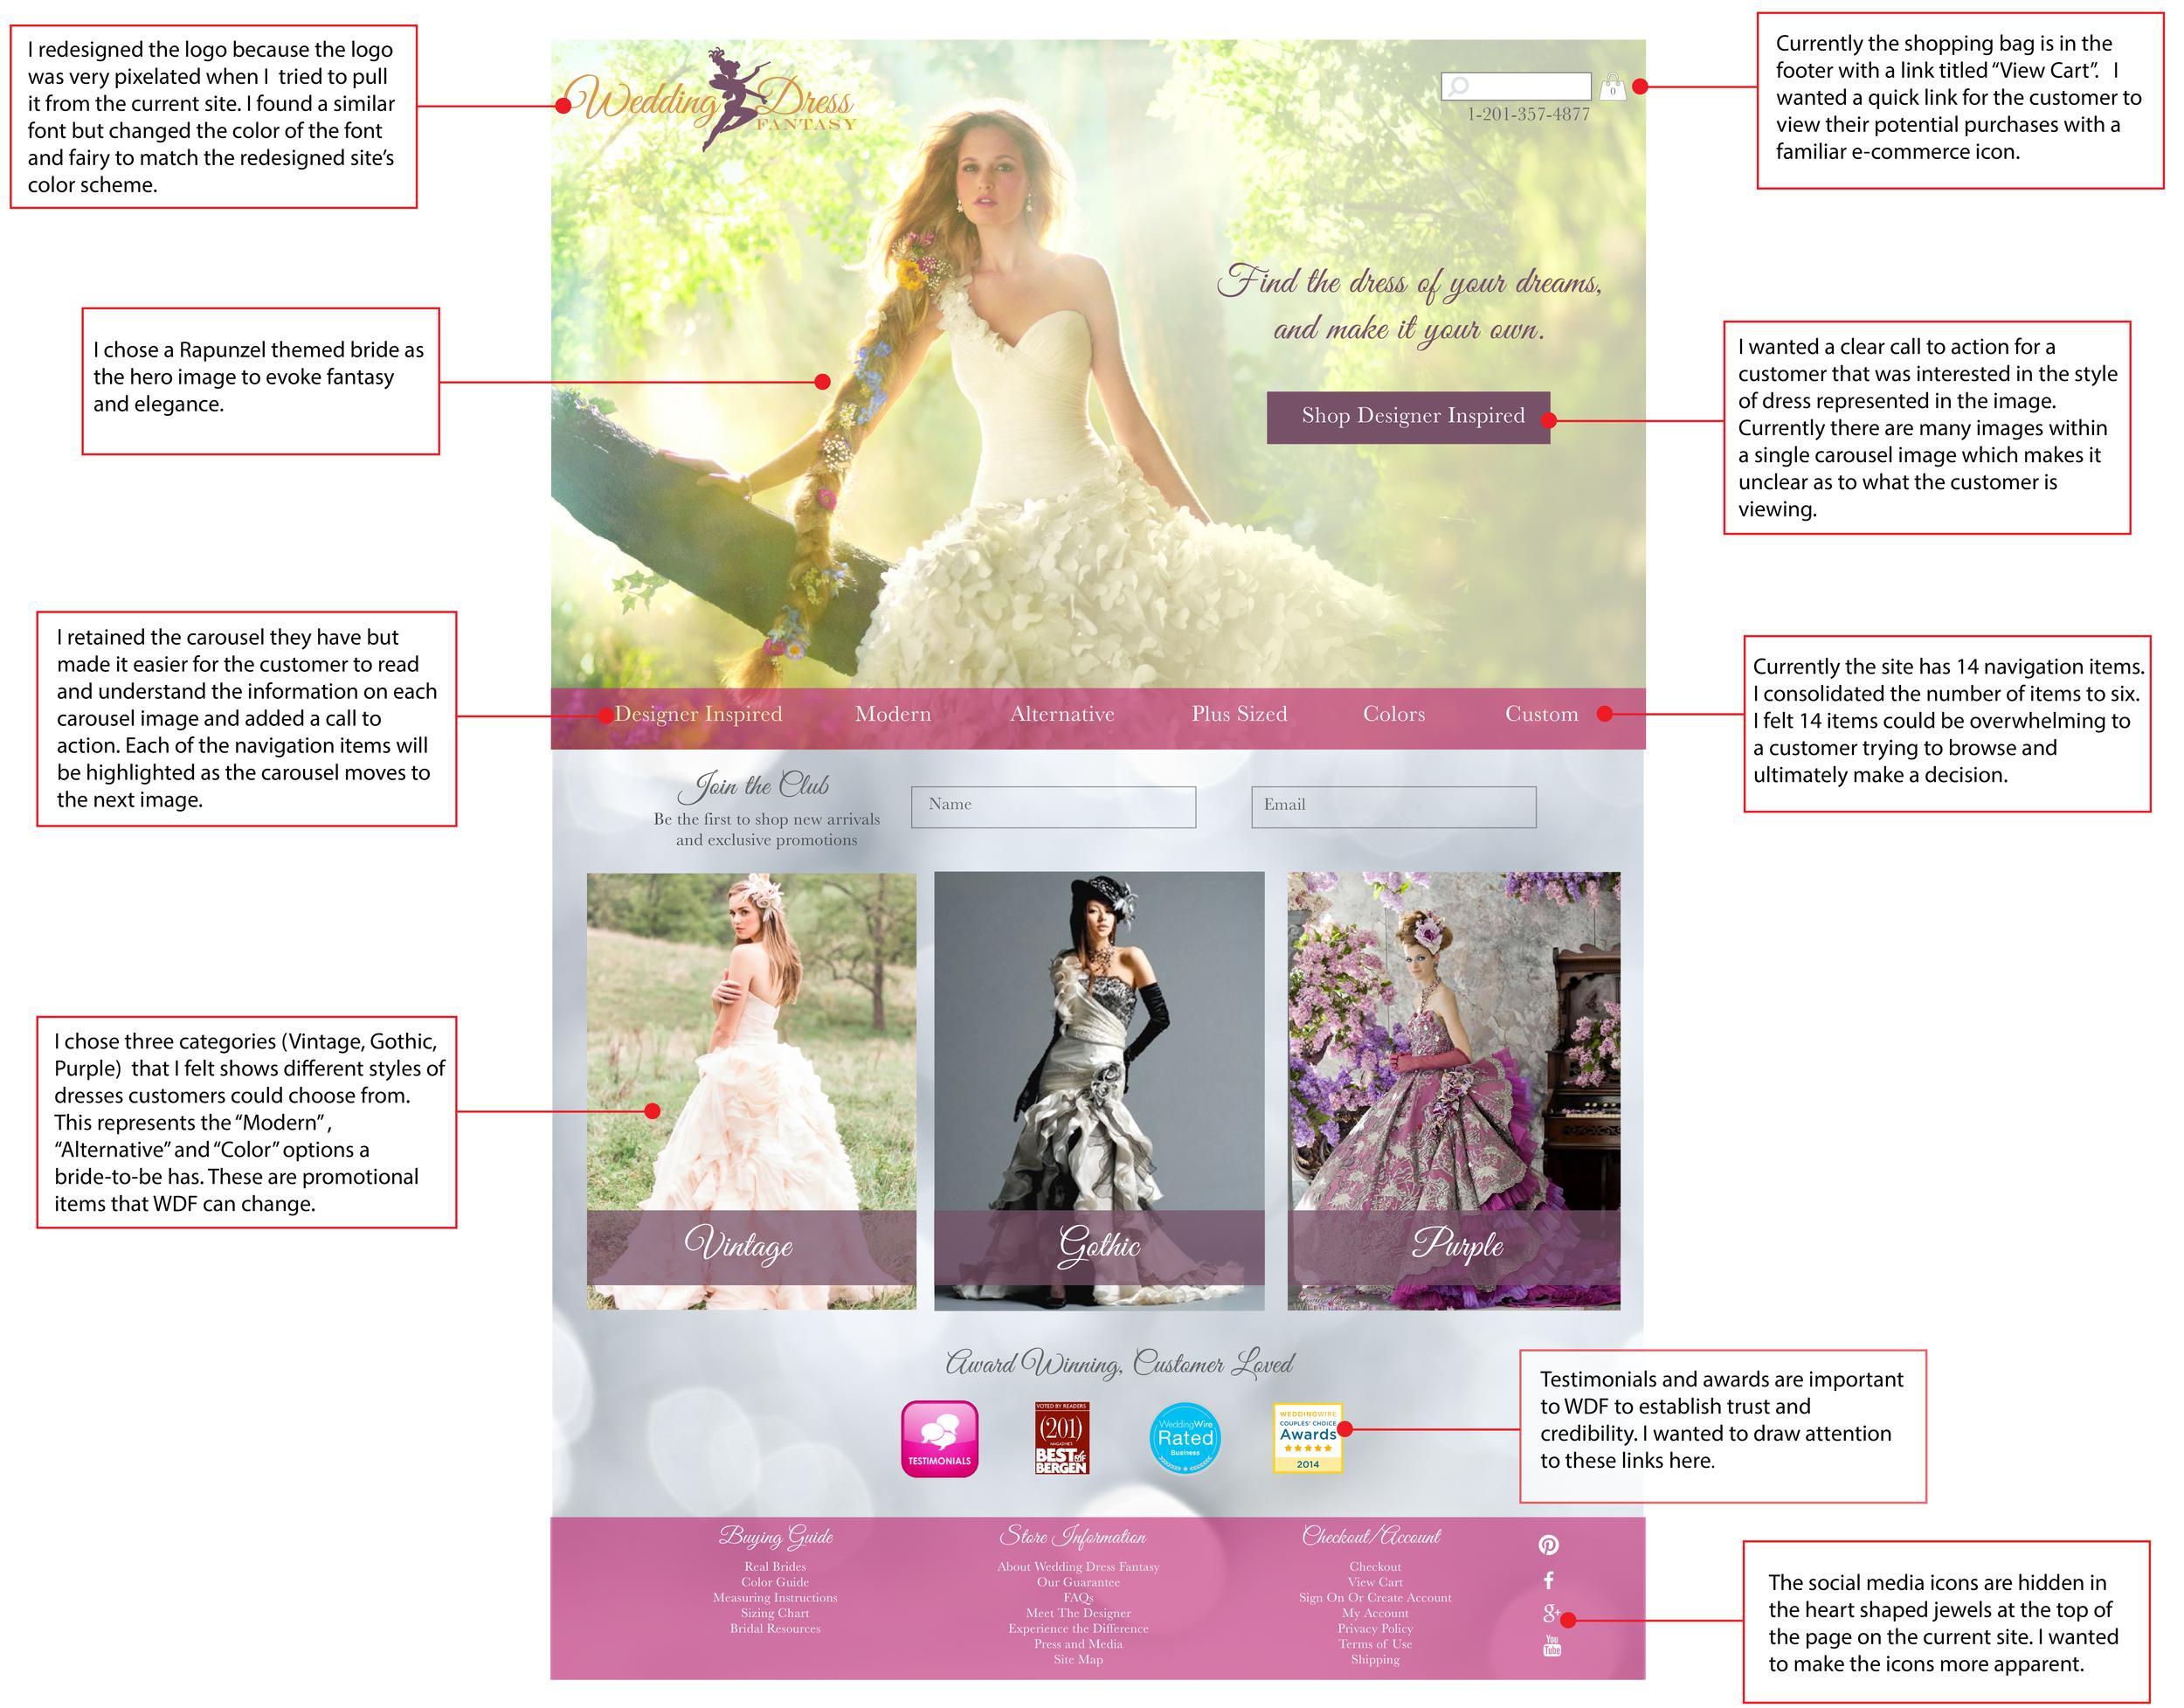 WeddingDressFantasyV3_FinalHomePageAnnotations-01.png